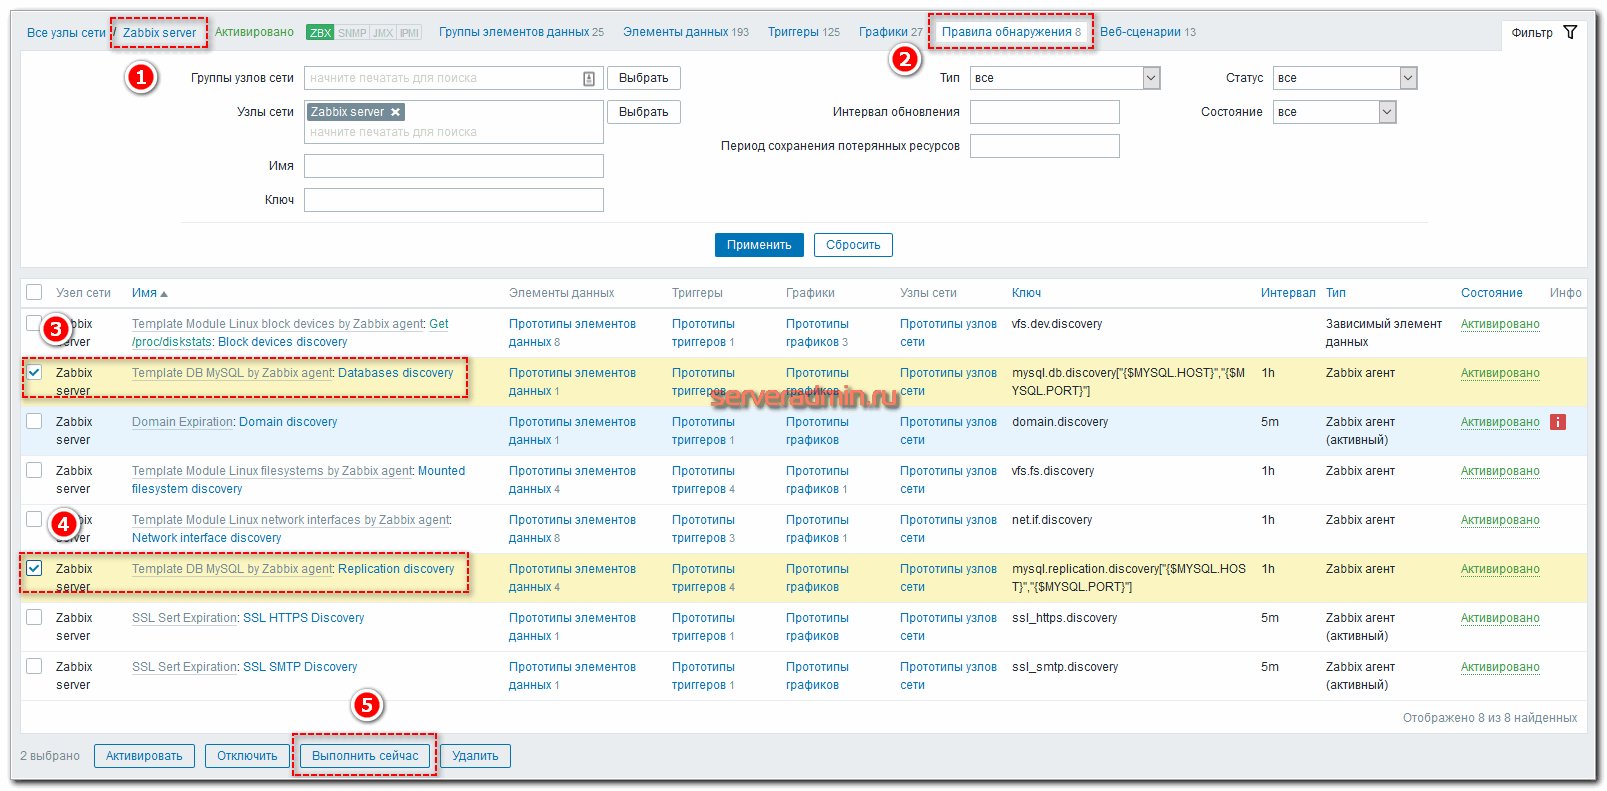 Мониторинг Mysql сервера